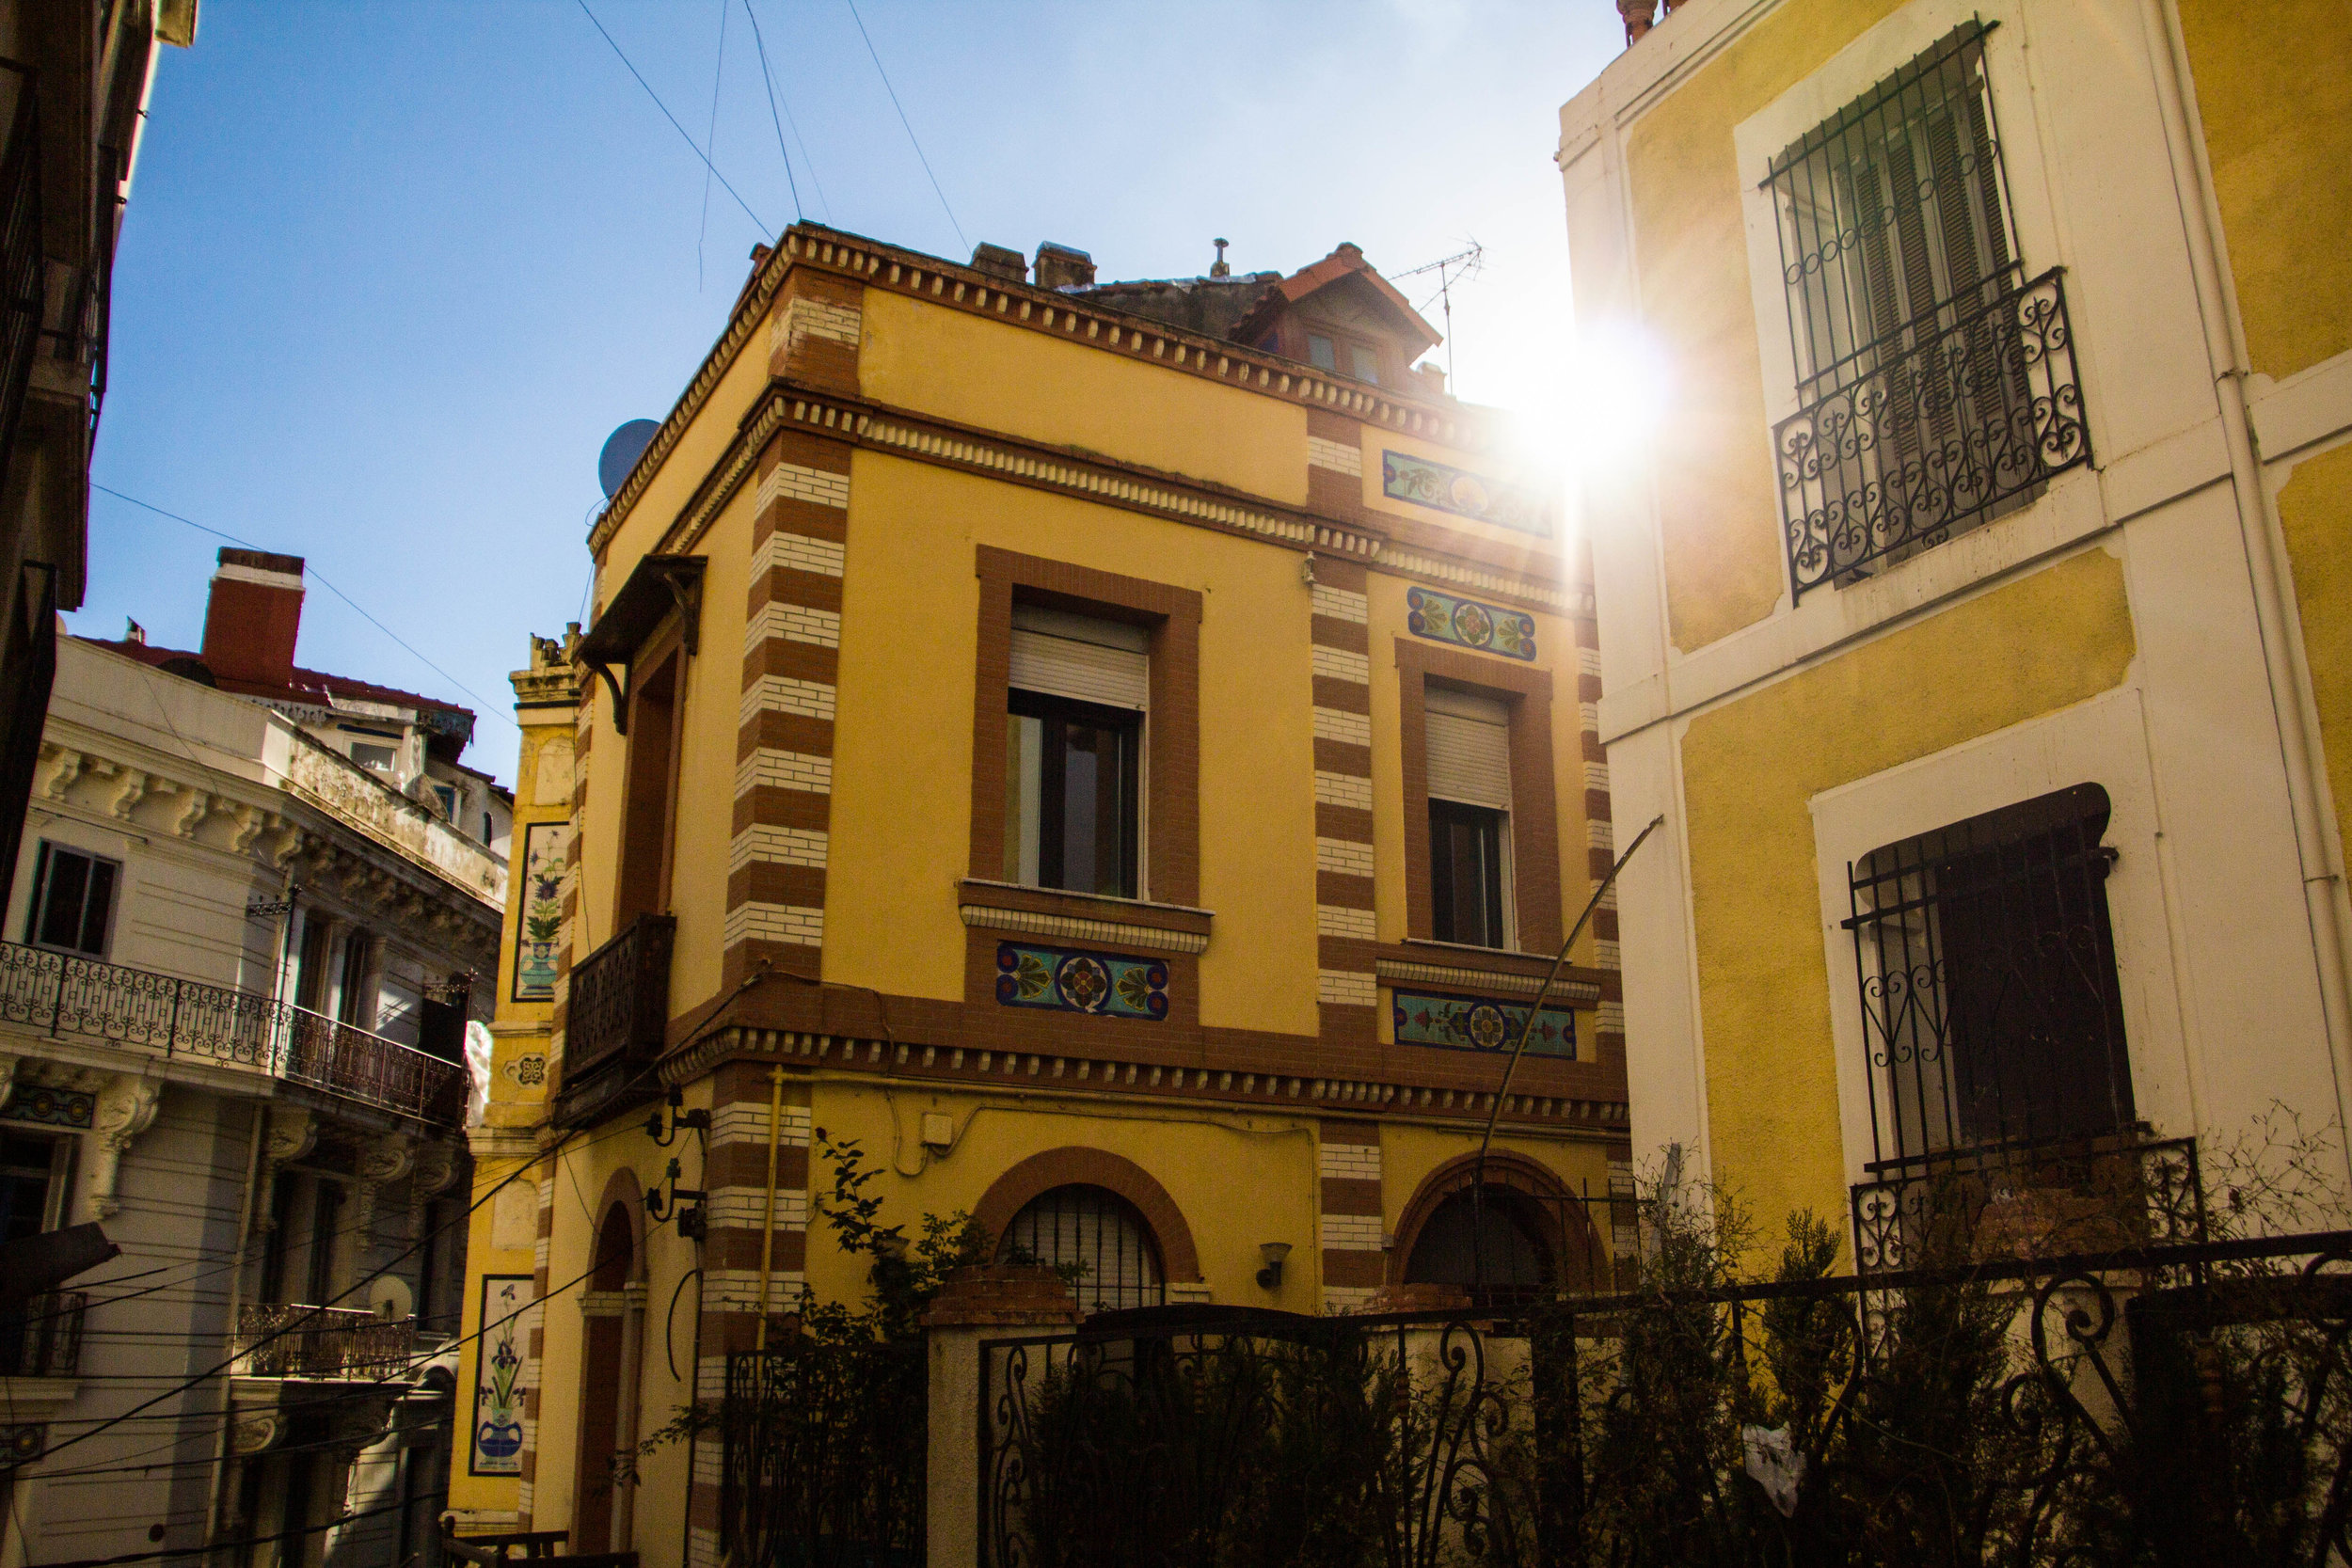 streets-algiers-algeria-18.jpg